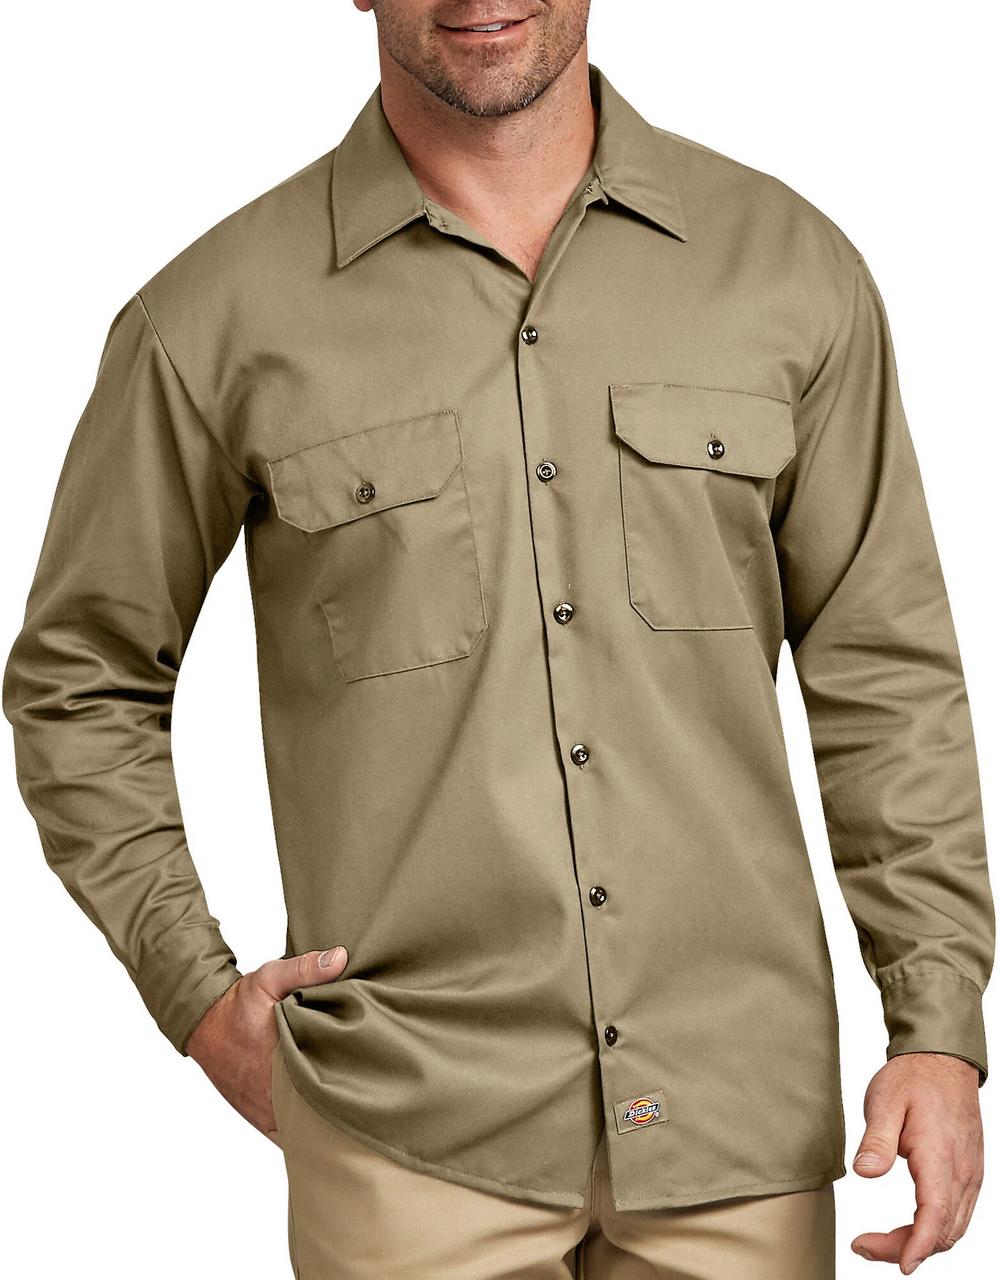 Dickies Long Sleeve Work Shirt, Military Khaki